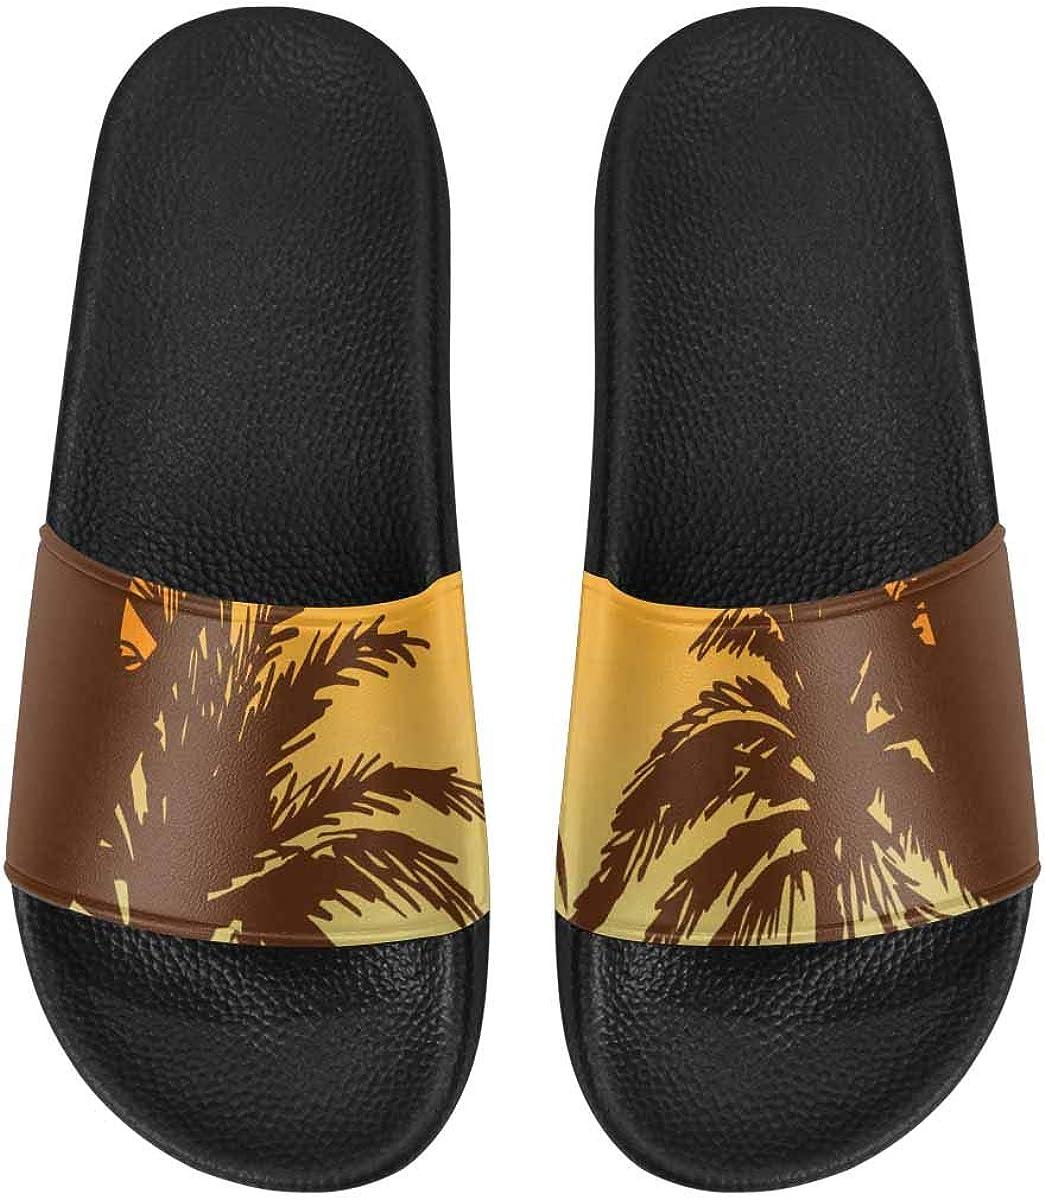 InterestPrint Women's Stylish Slipper Sandals for Summer Tropical Palms Summer